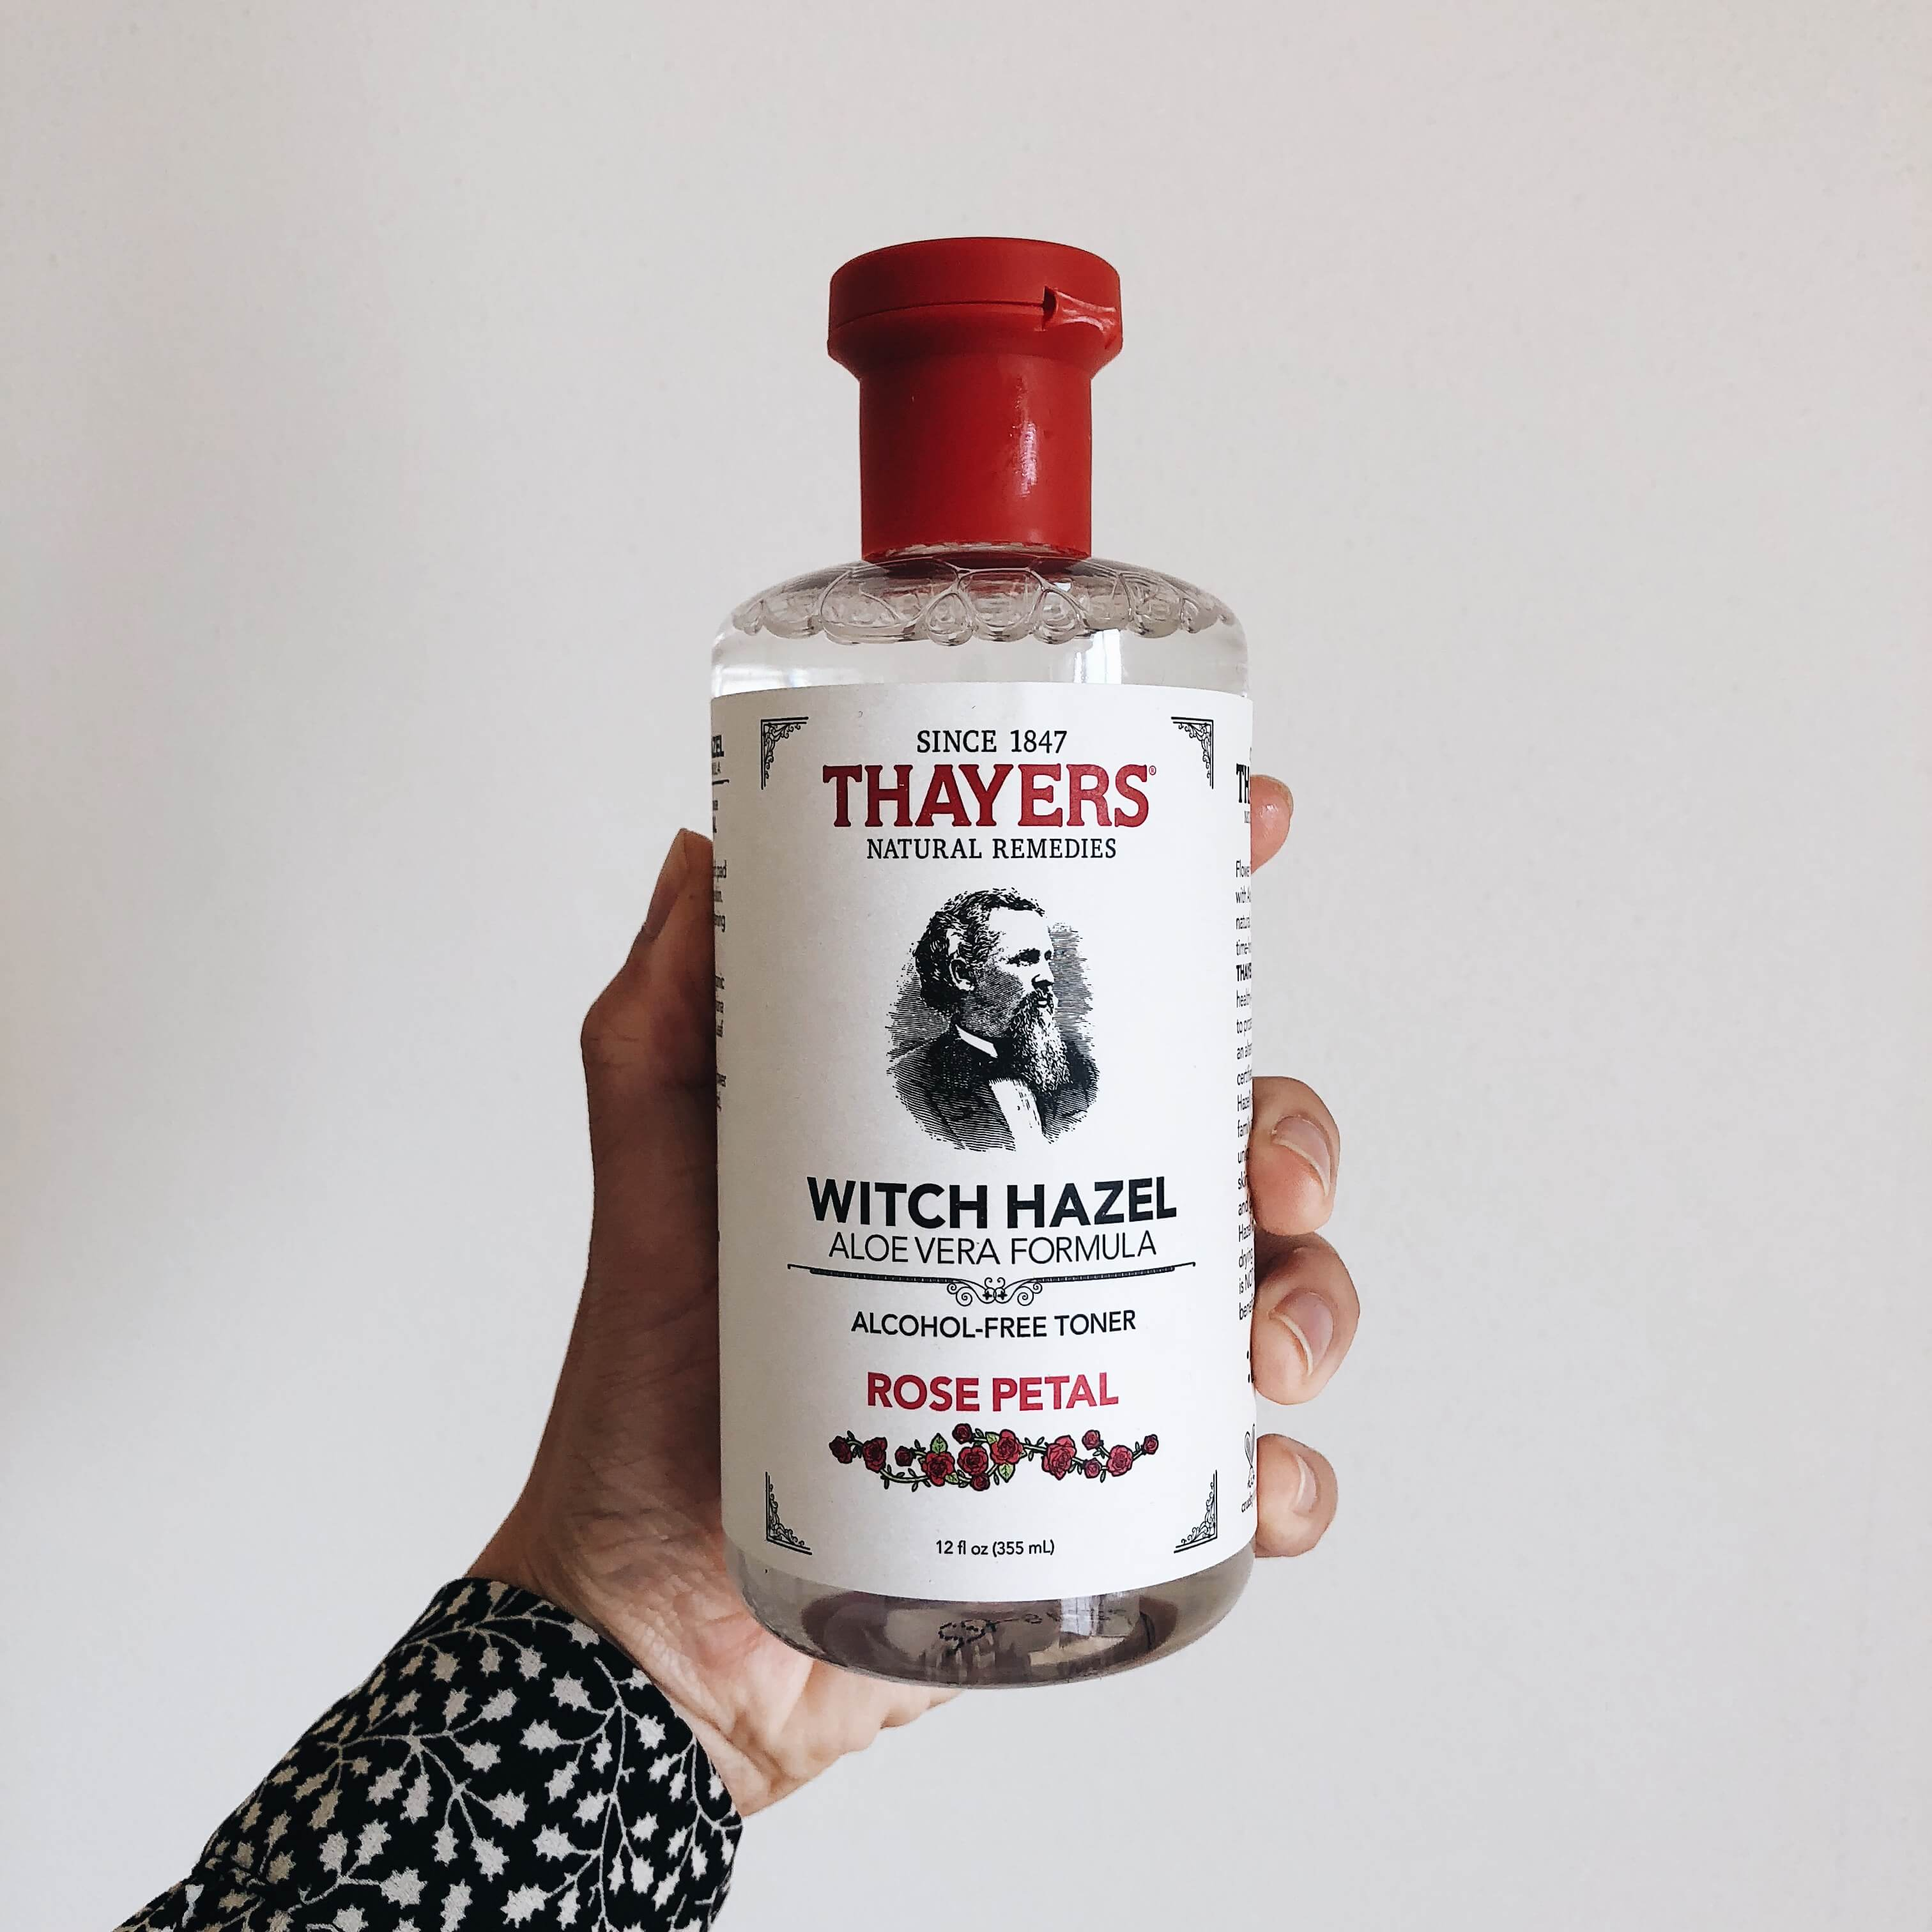 Thayers, ウィッチヘーゼル(マンサク)アロエベラフォーミュラ, アルコールフリートナー